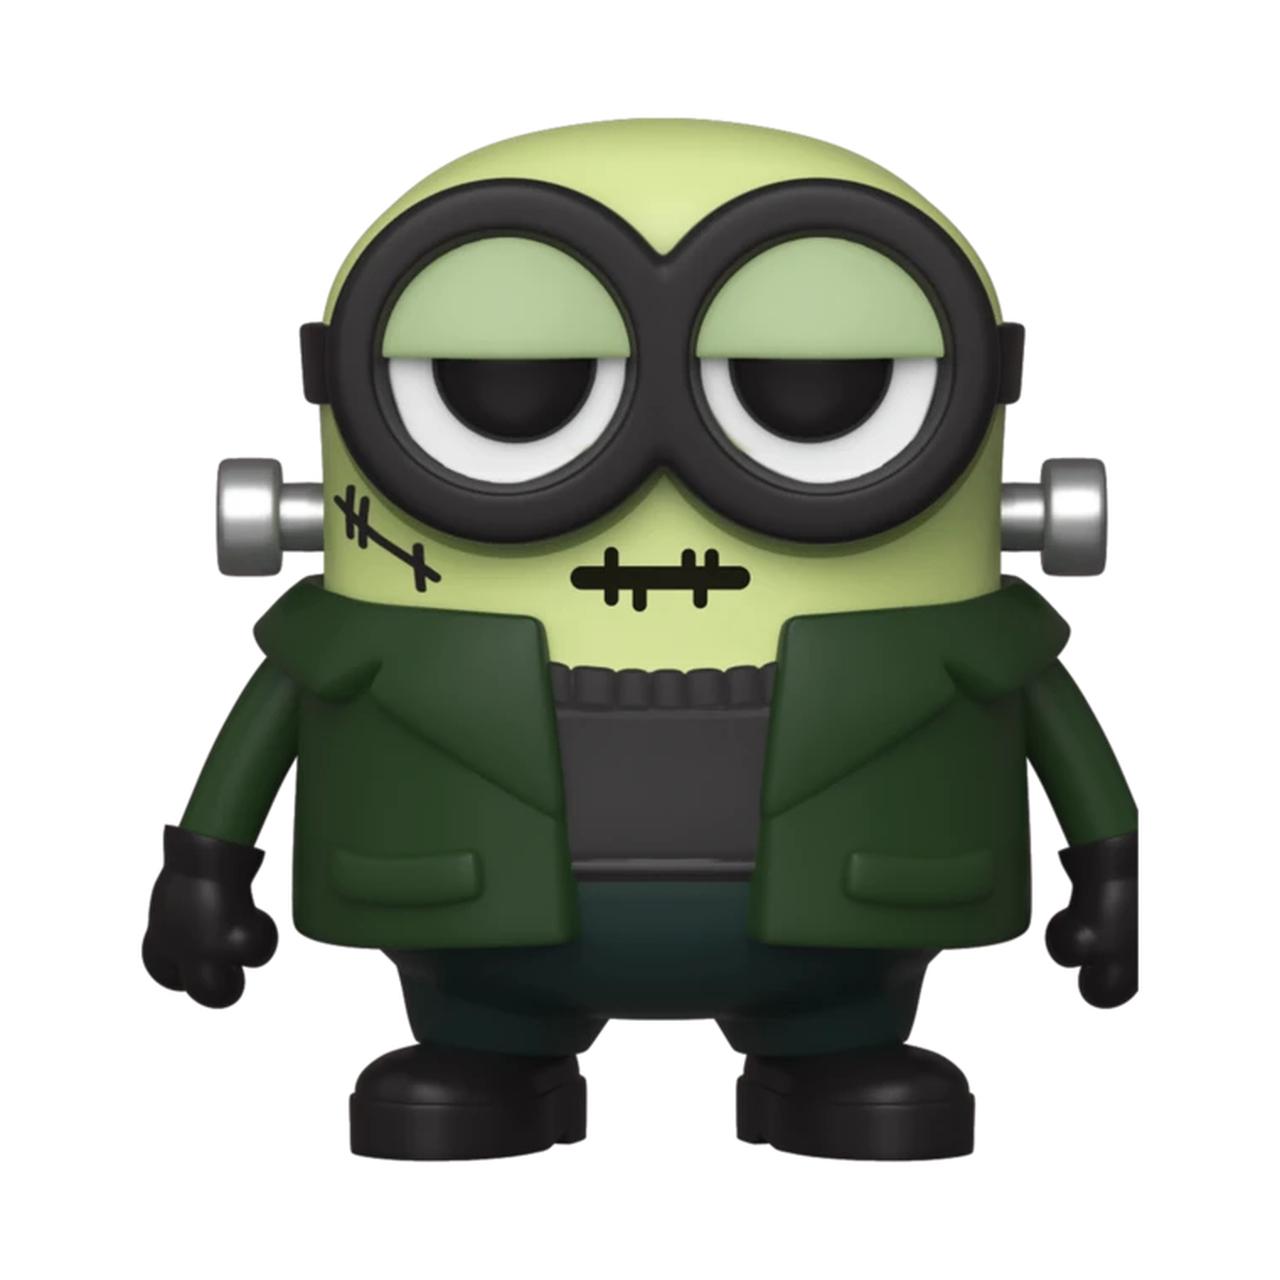 Funko Pop! FrankenBob: Minions #969 - Funko